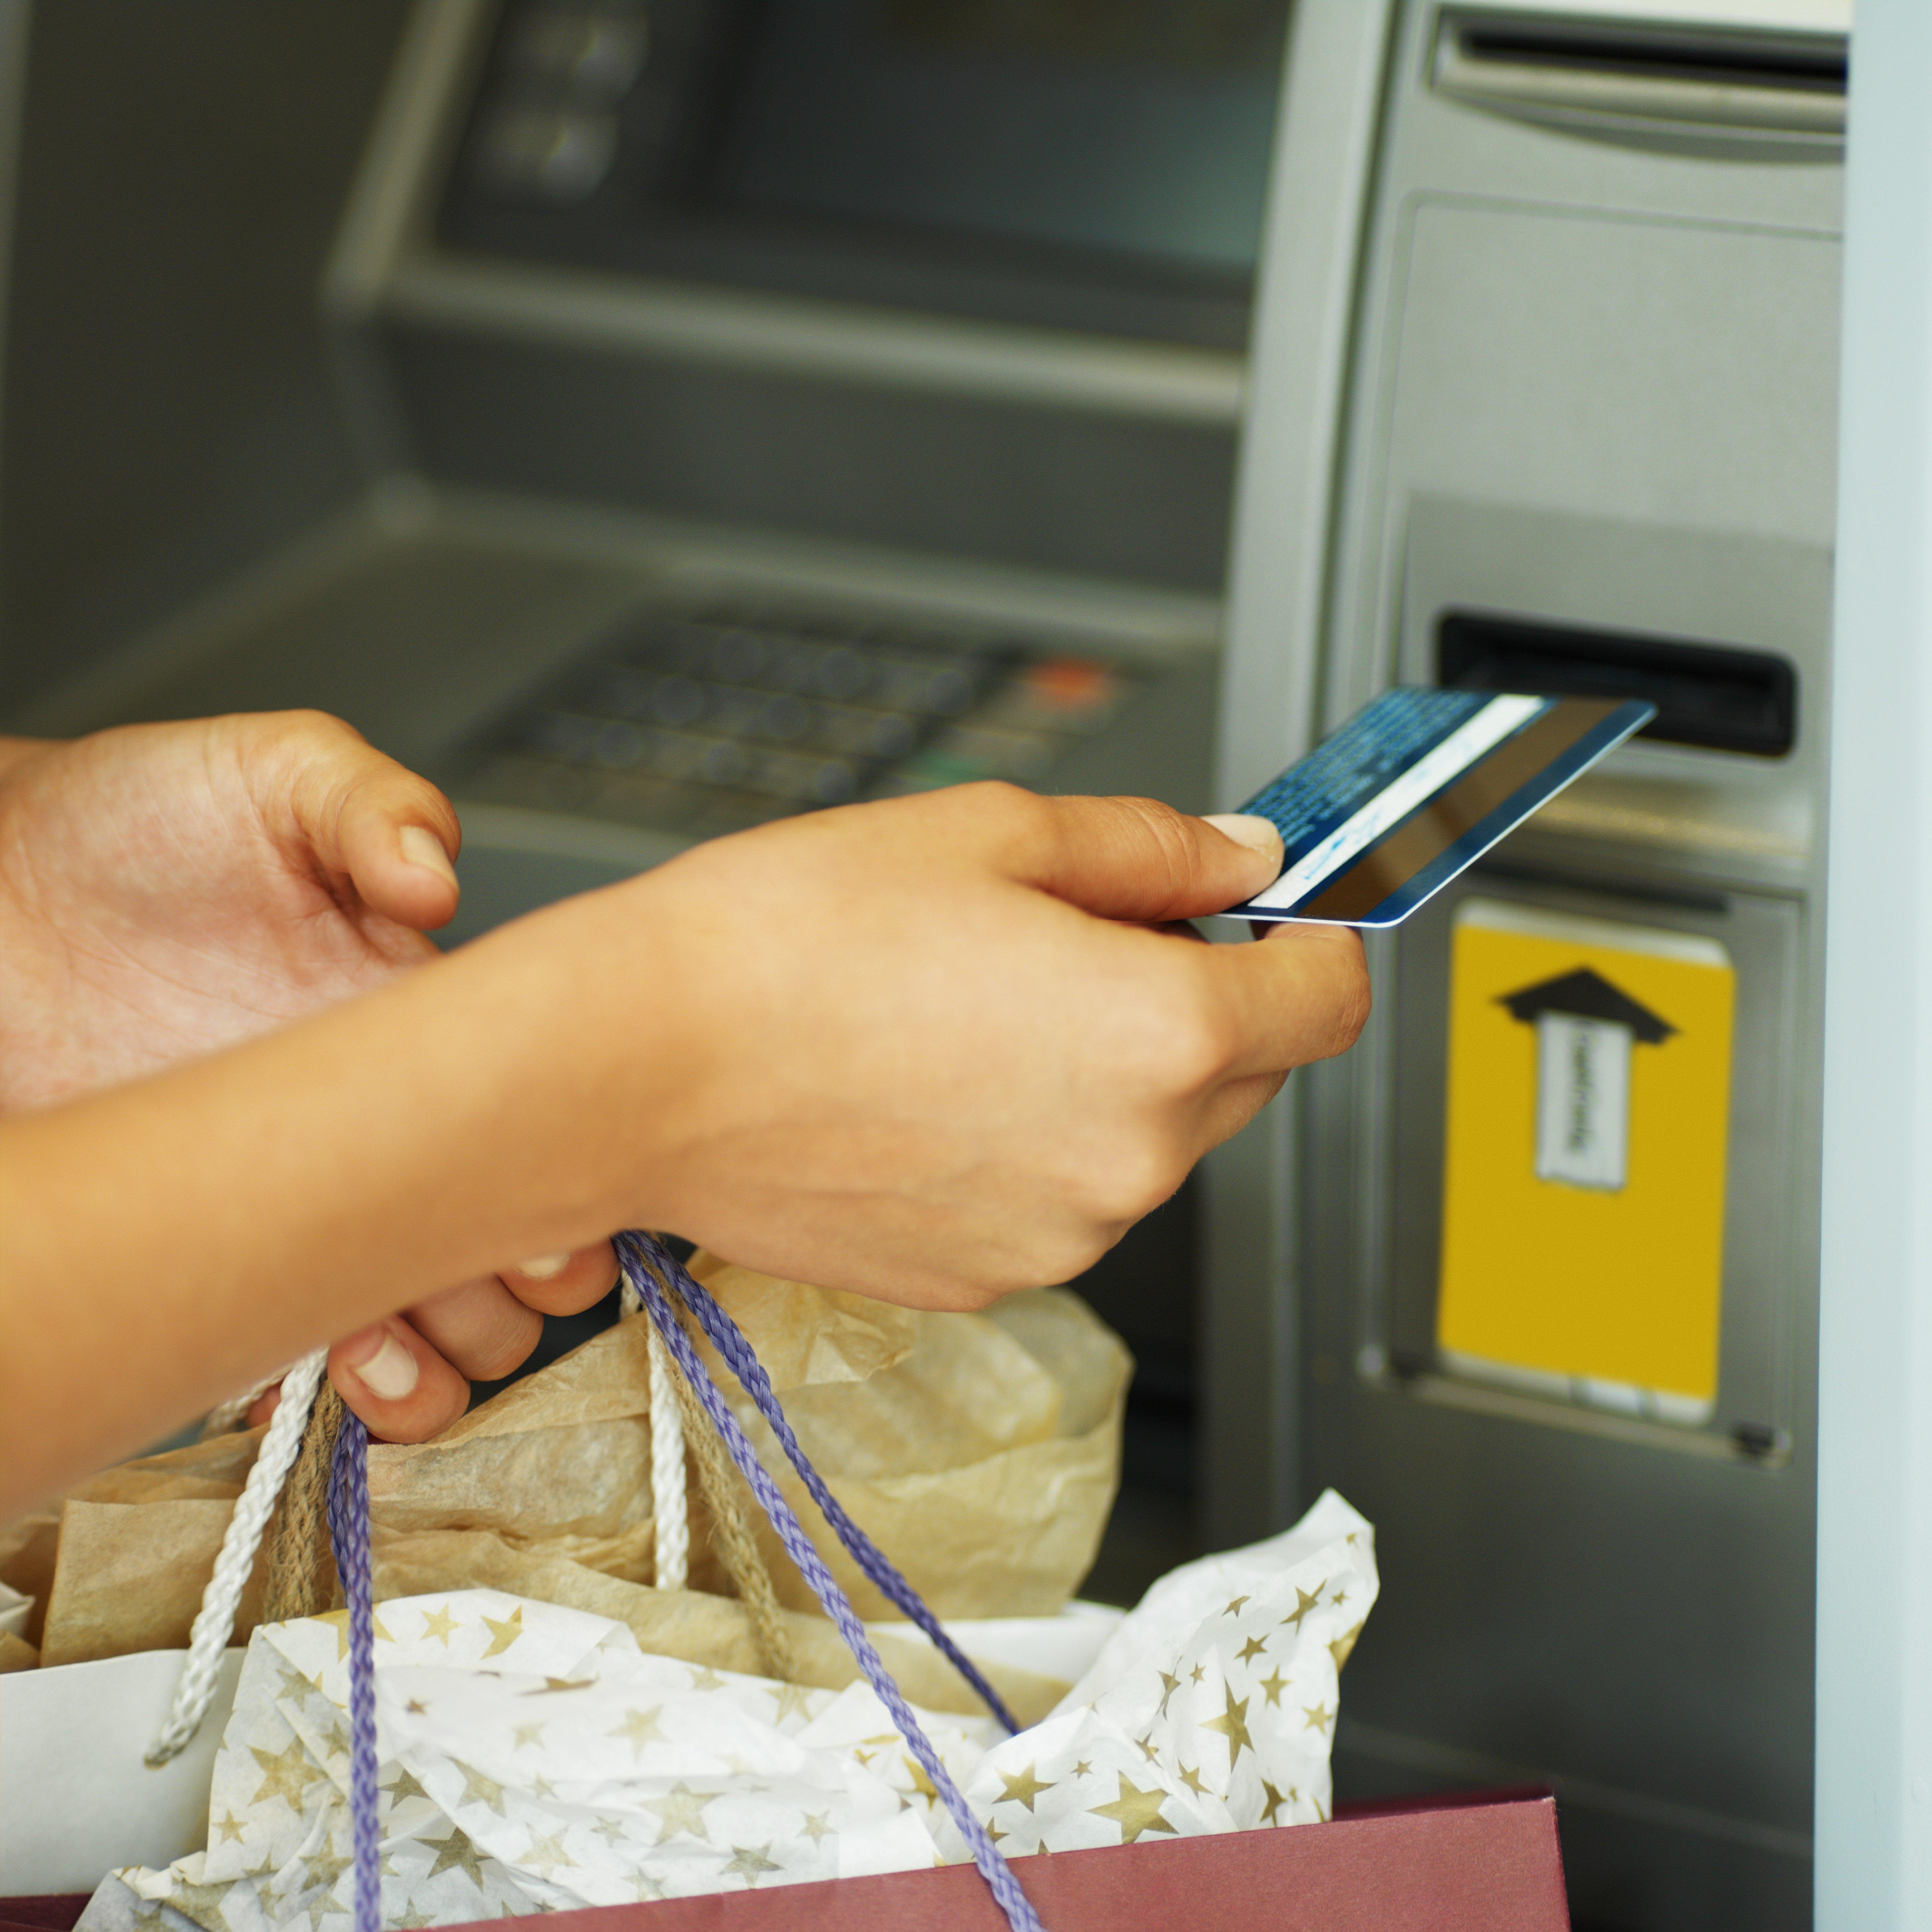 debit card at atm